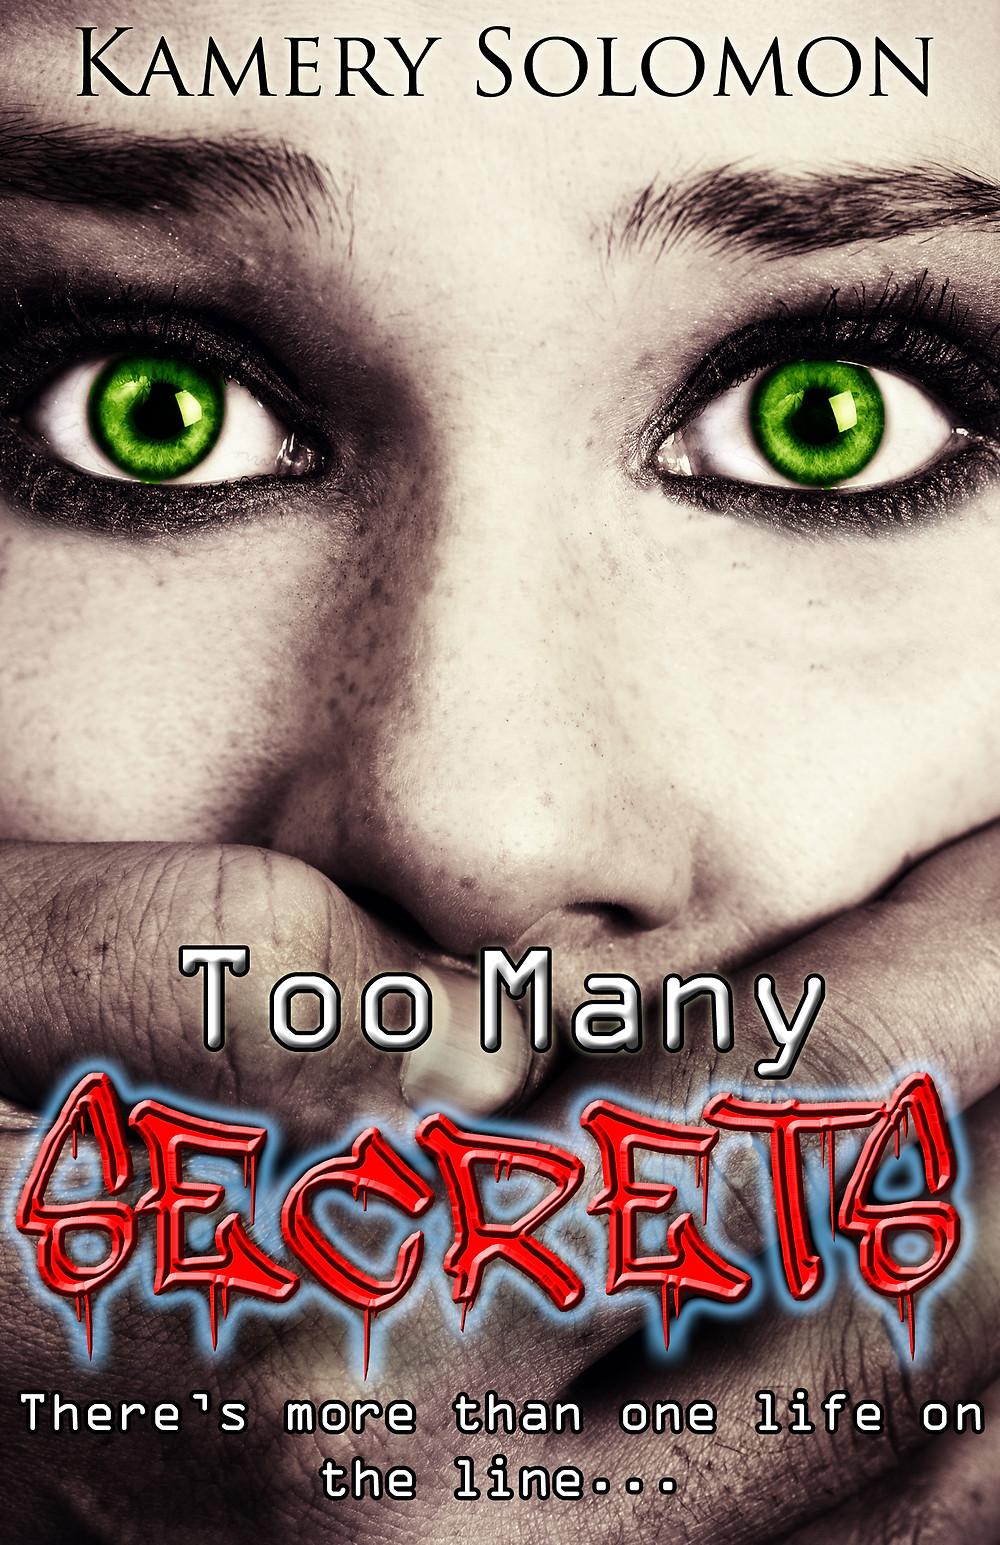 Too Many Secrets copy.jpg